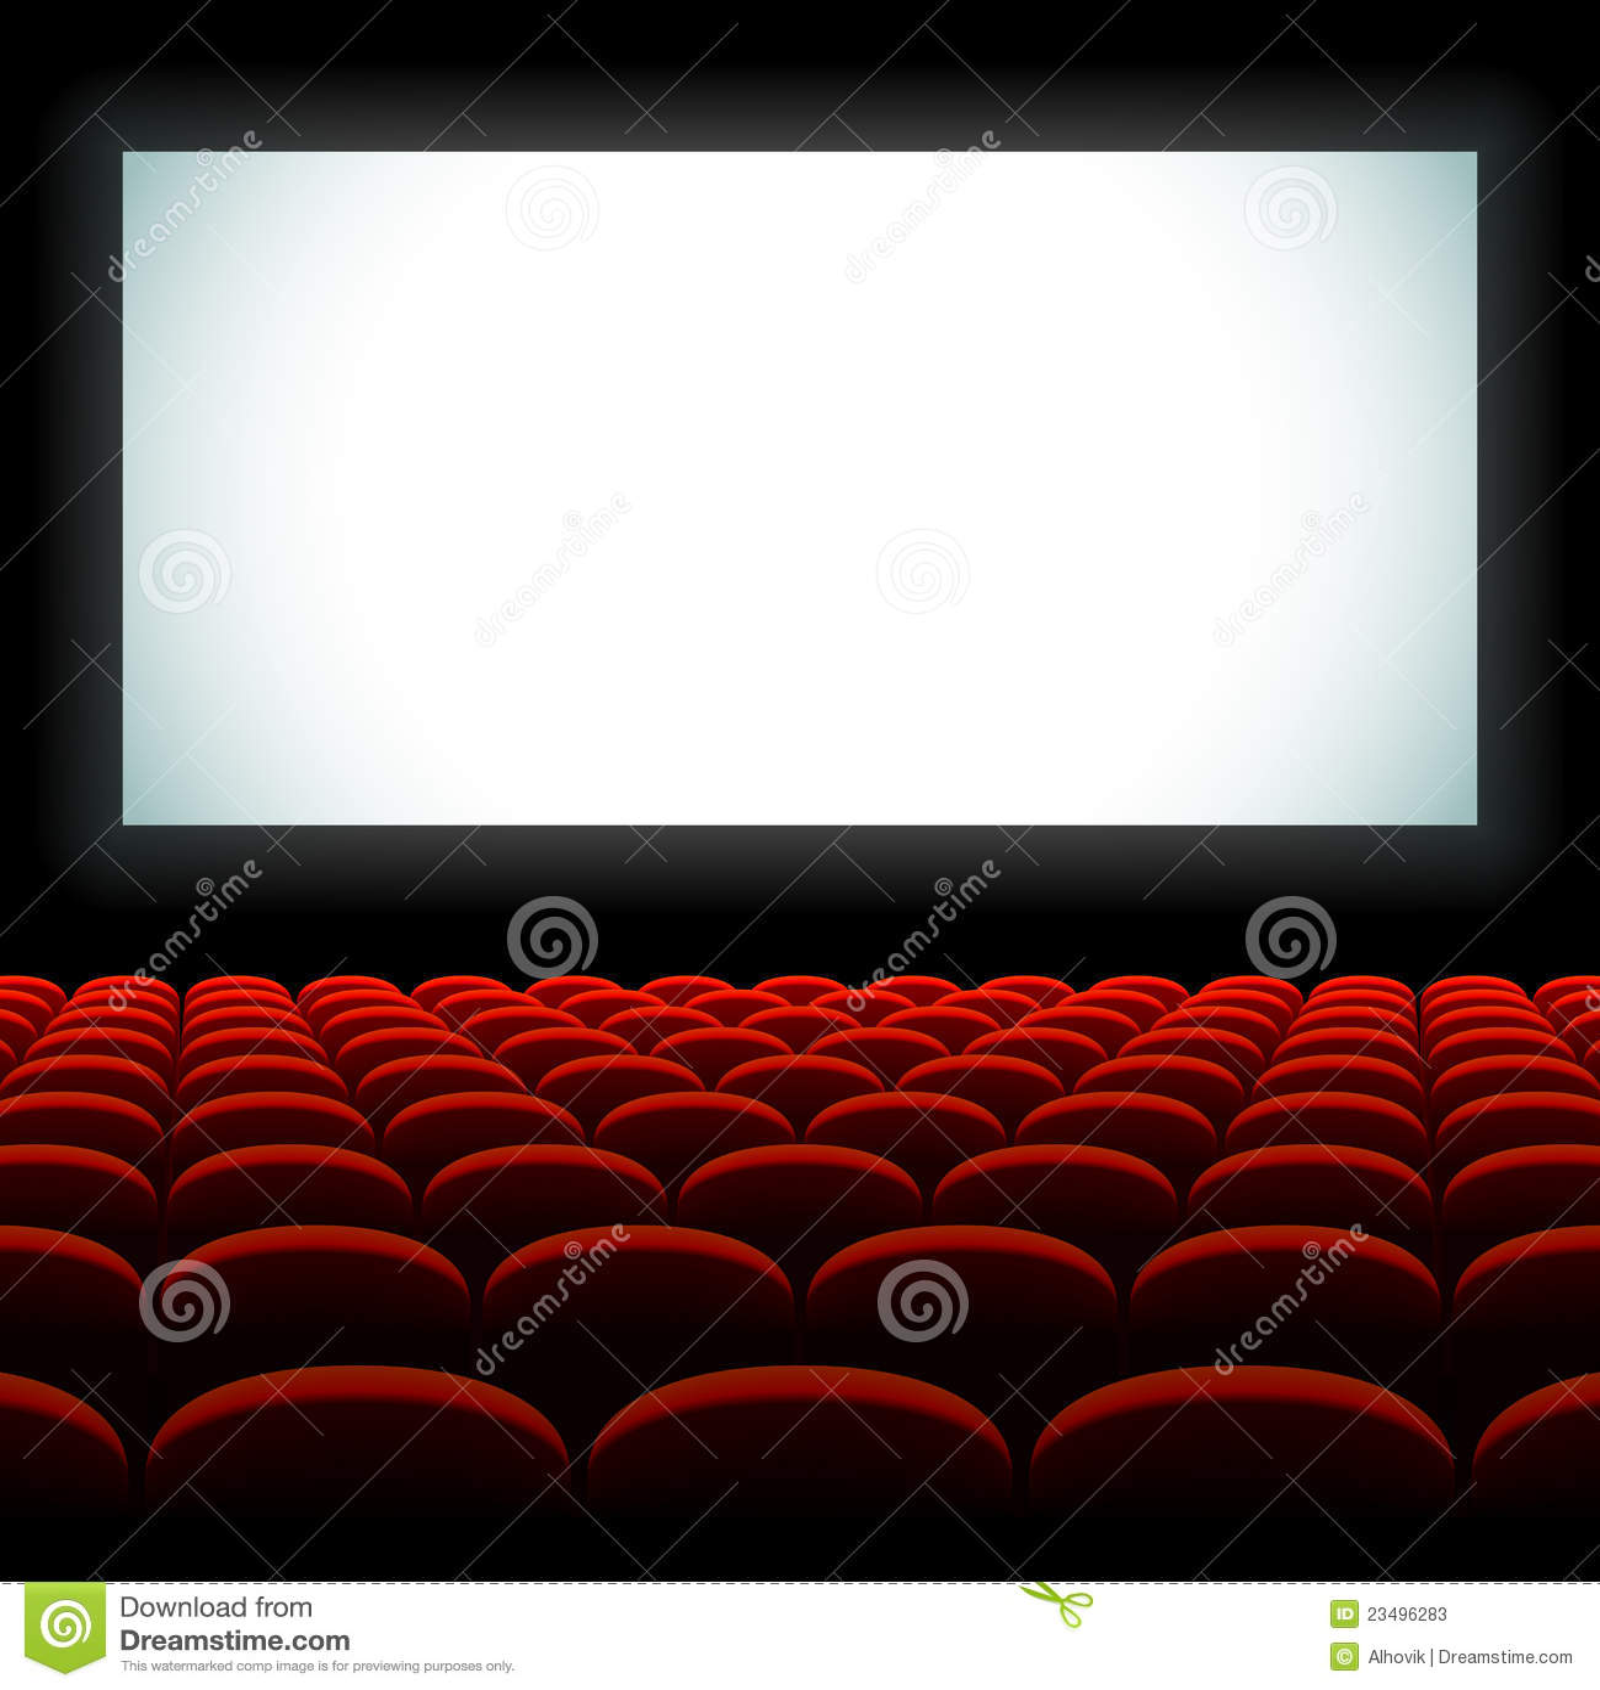 Cinema Auditorium With Screen And Seats Stock Photos Image 23496283